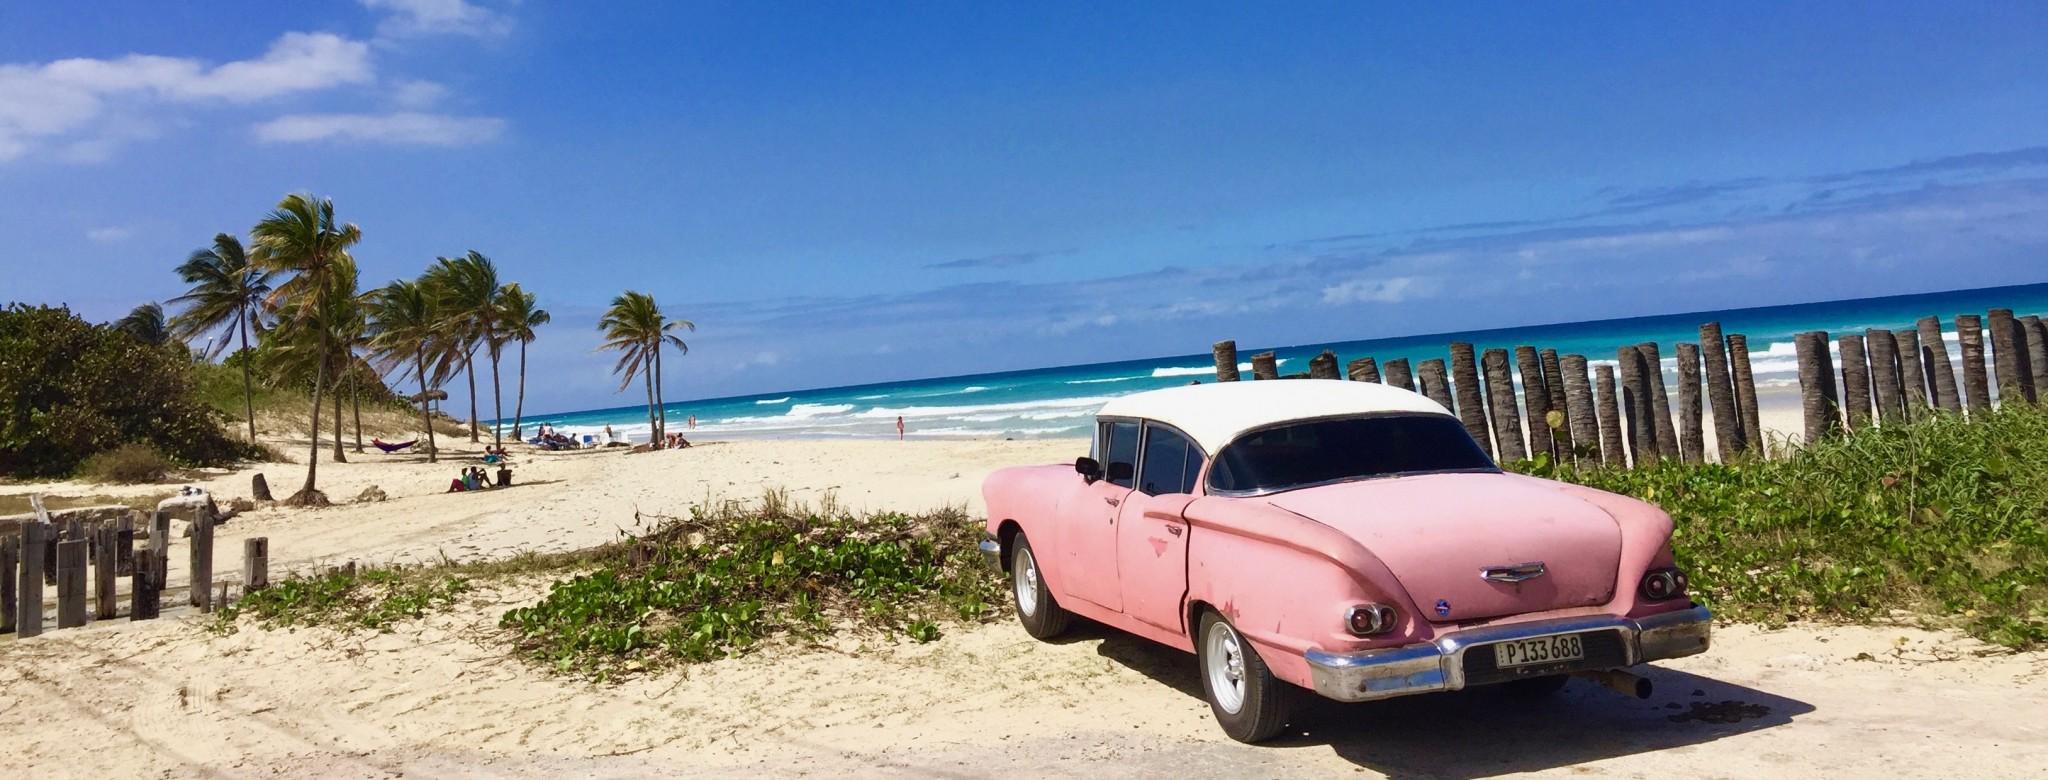 Kuba-Strand-rosa-Oldtimer-